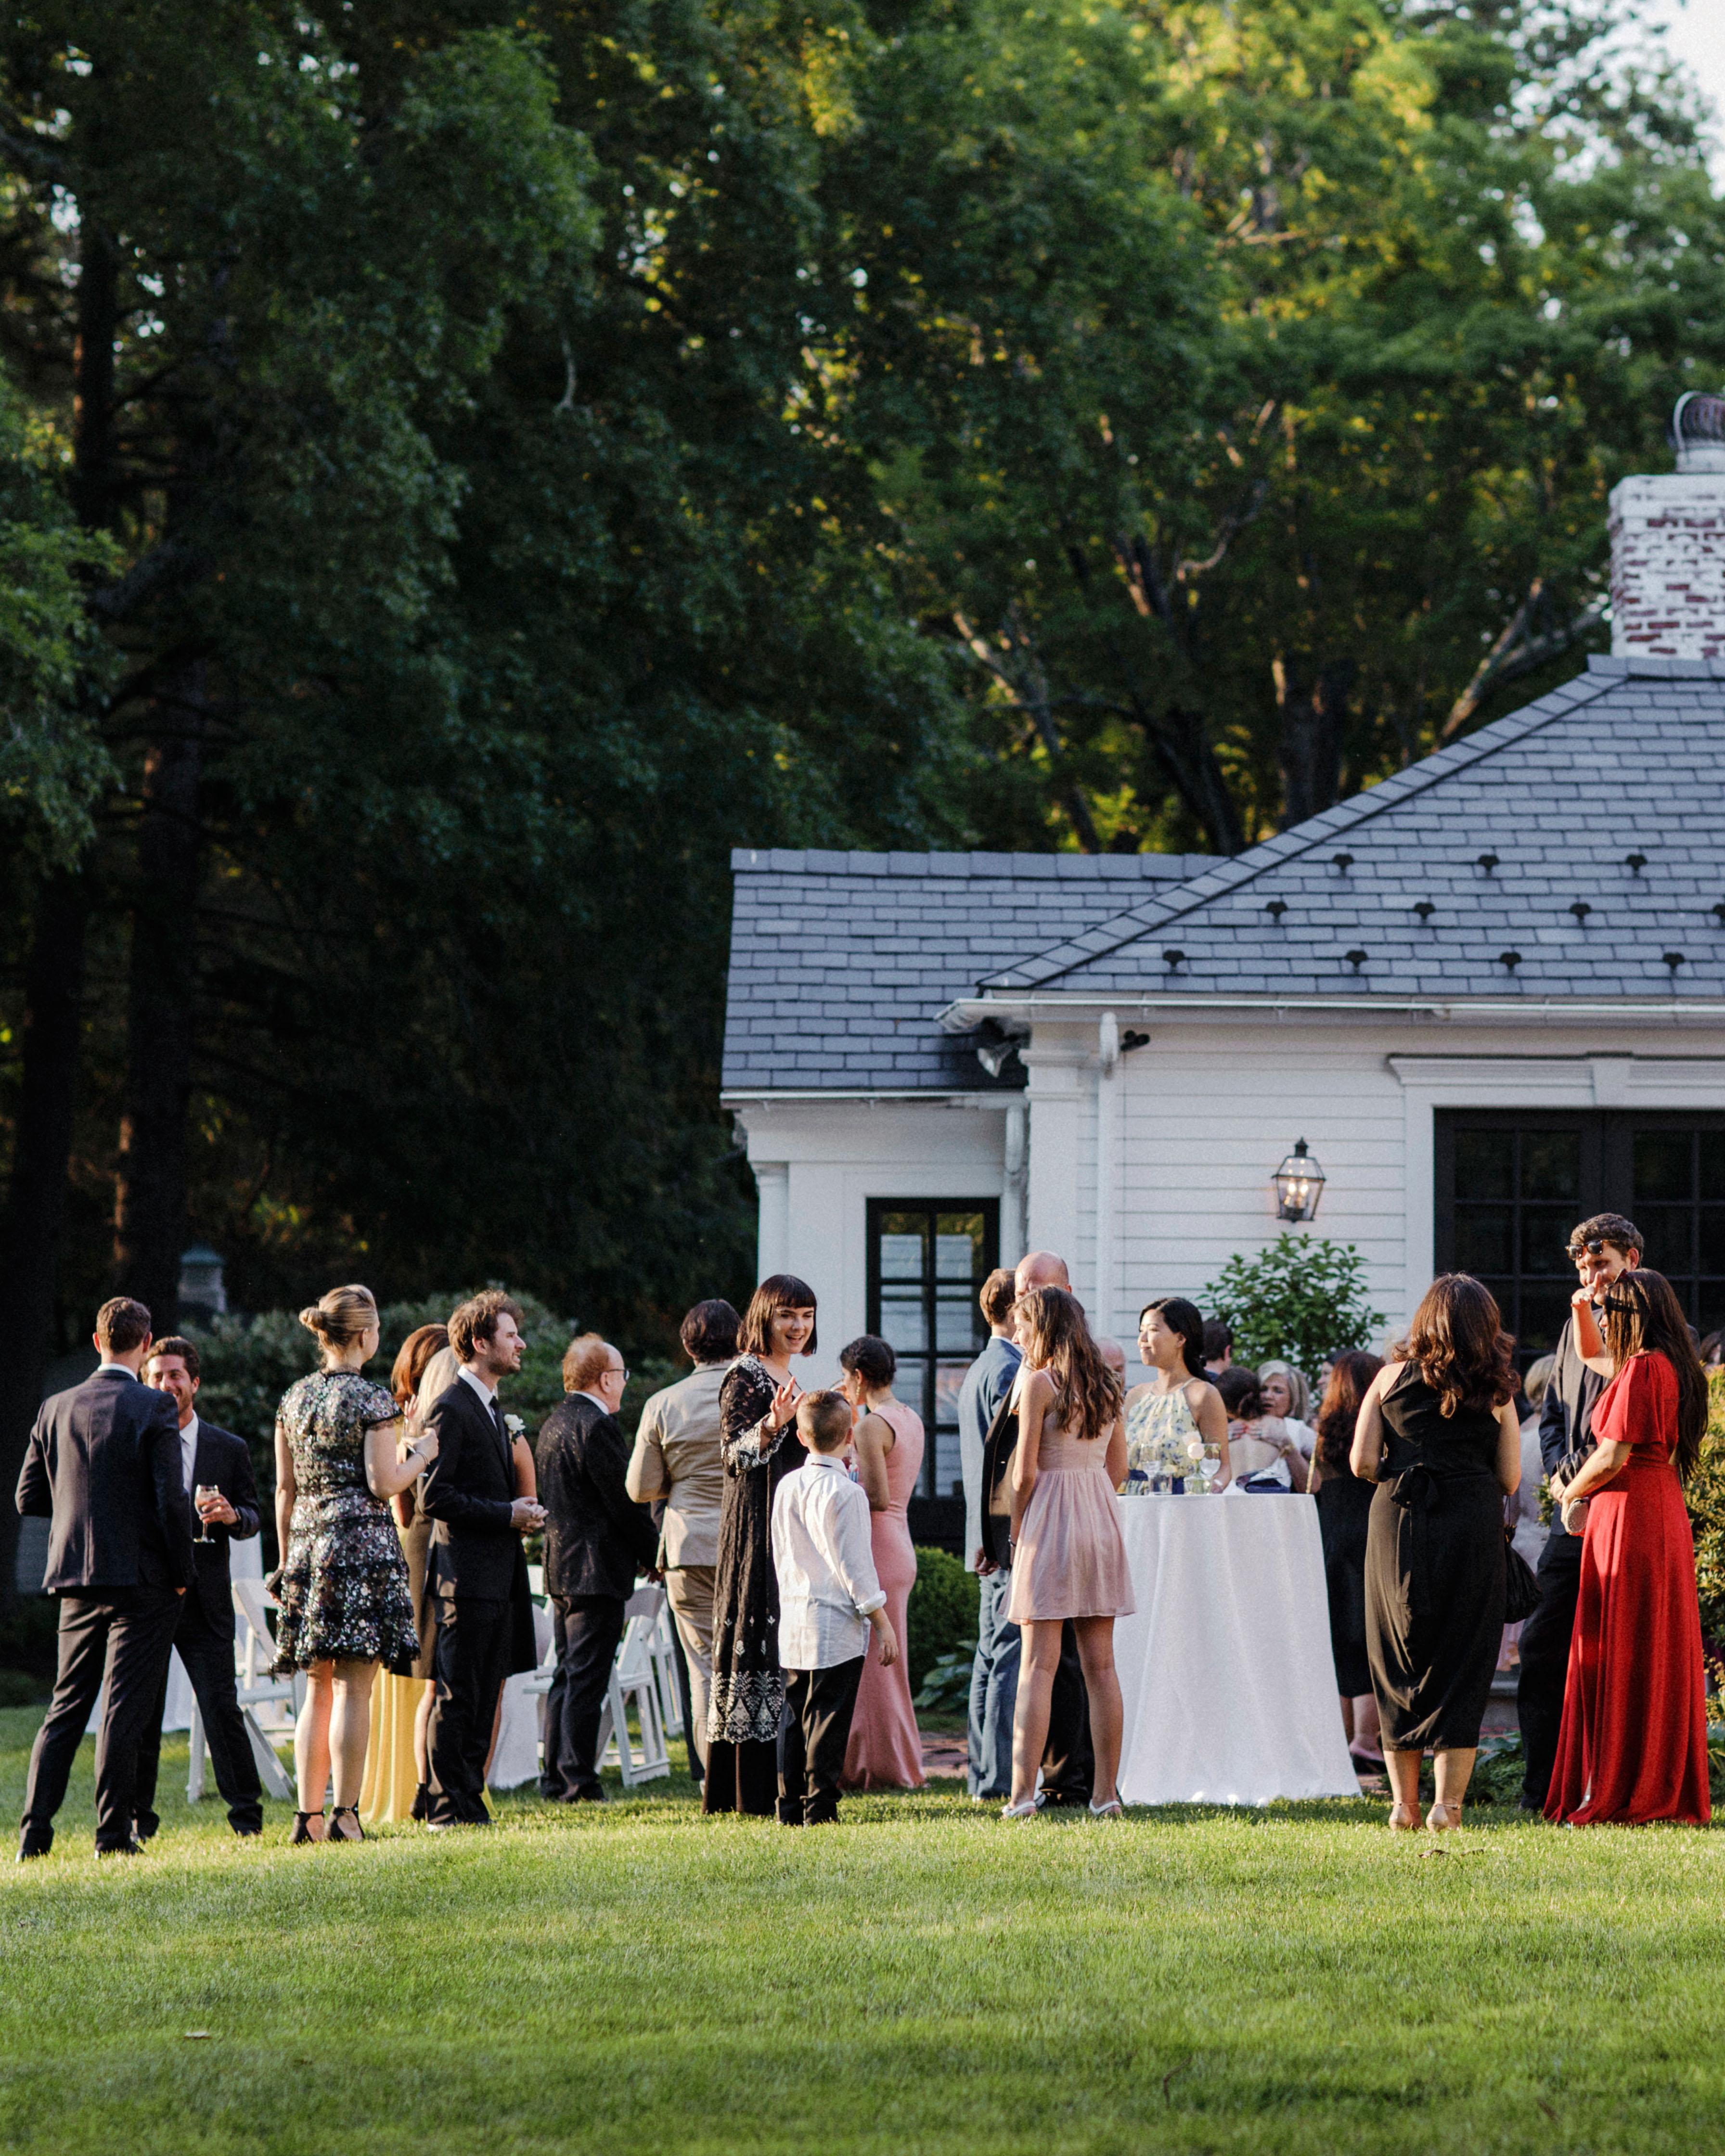 eden jack wedding cocktail hour